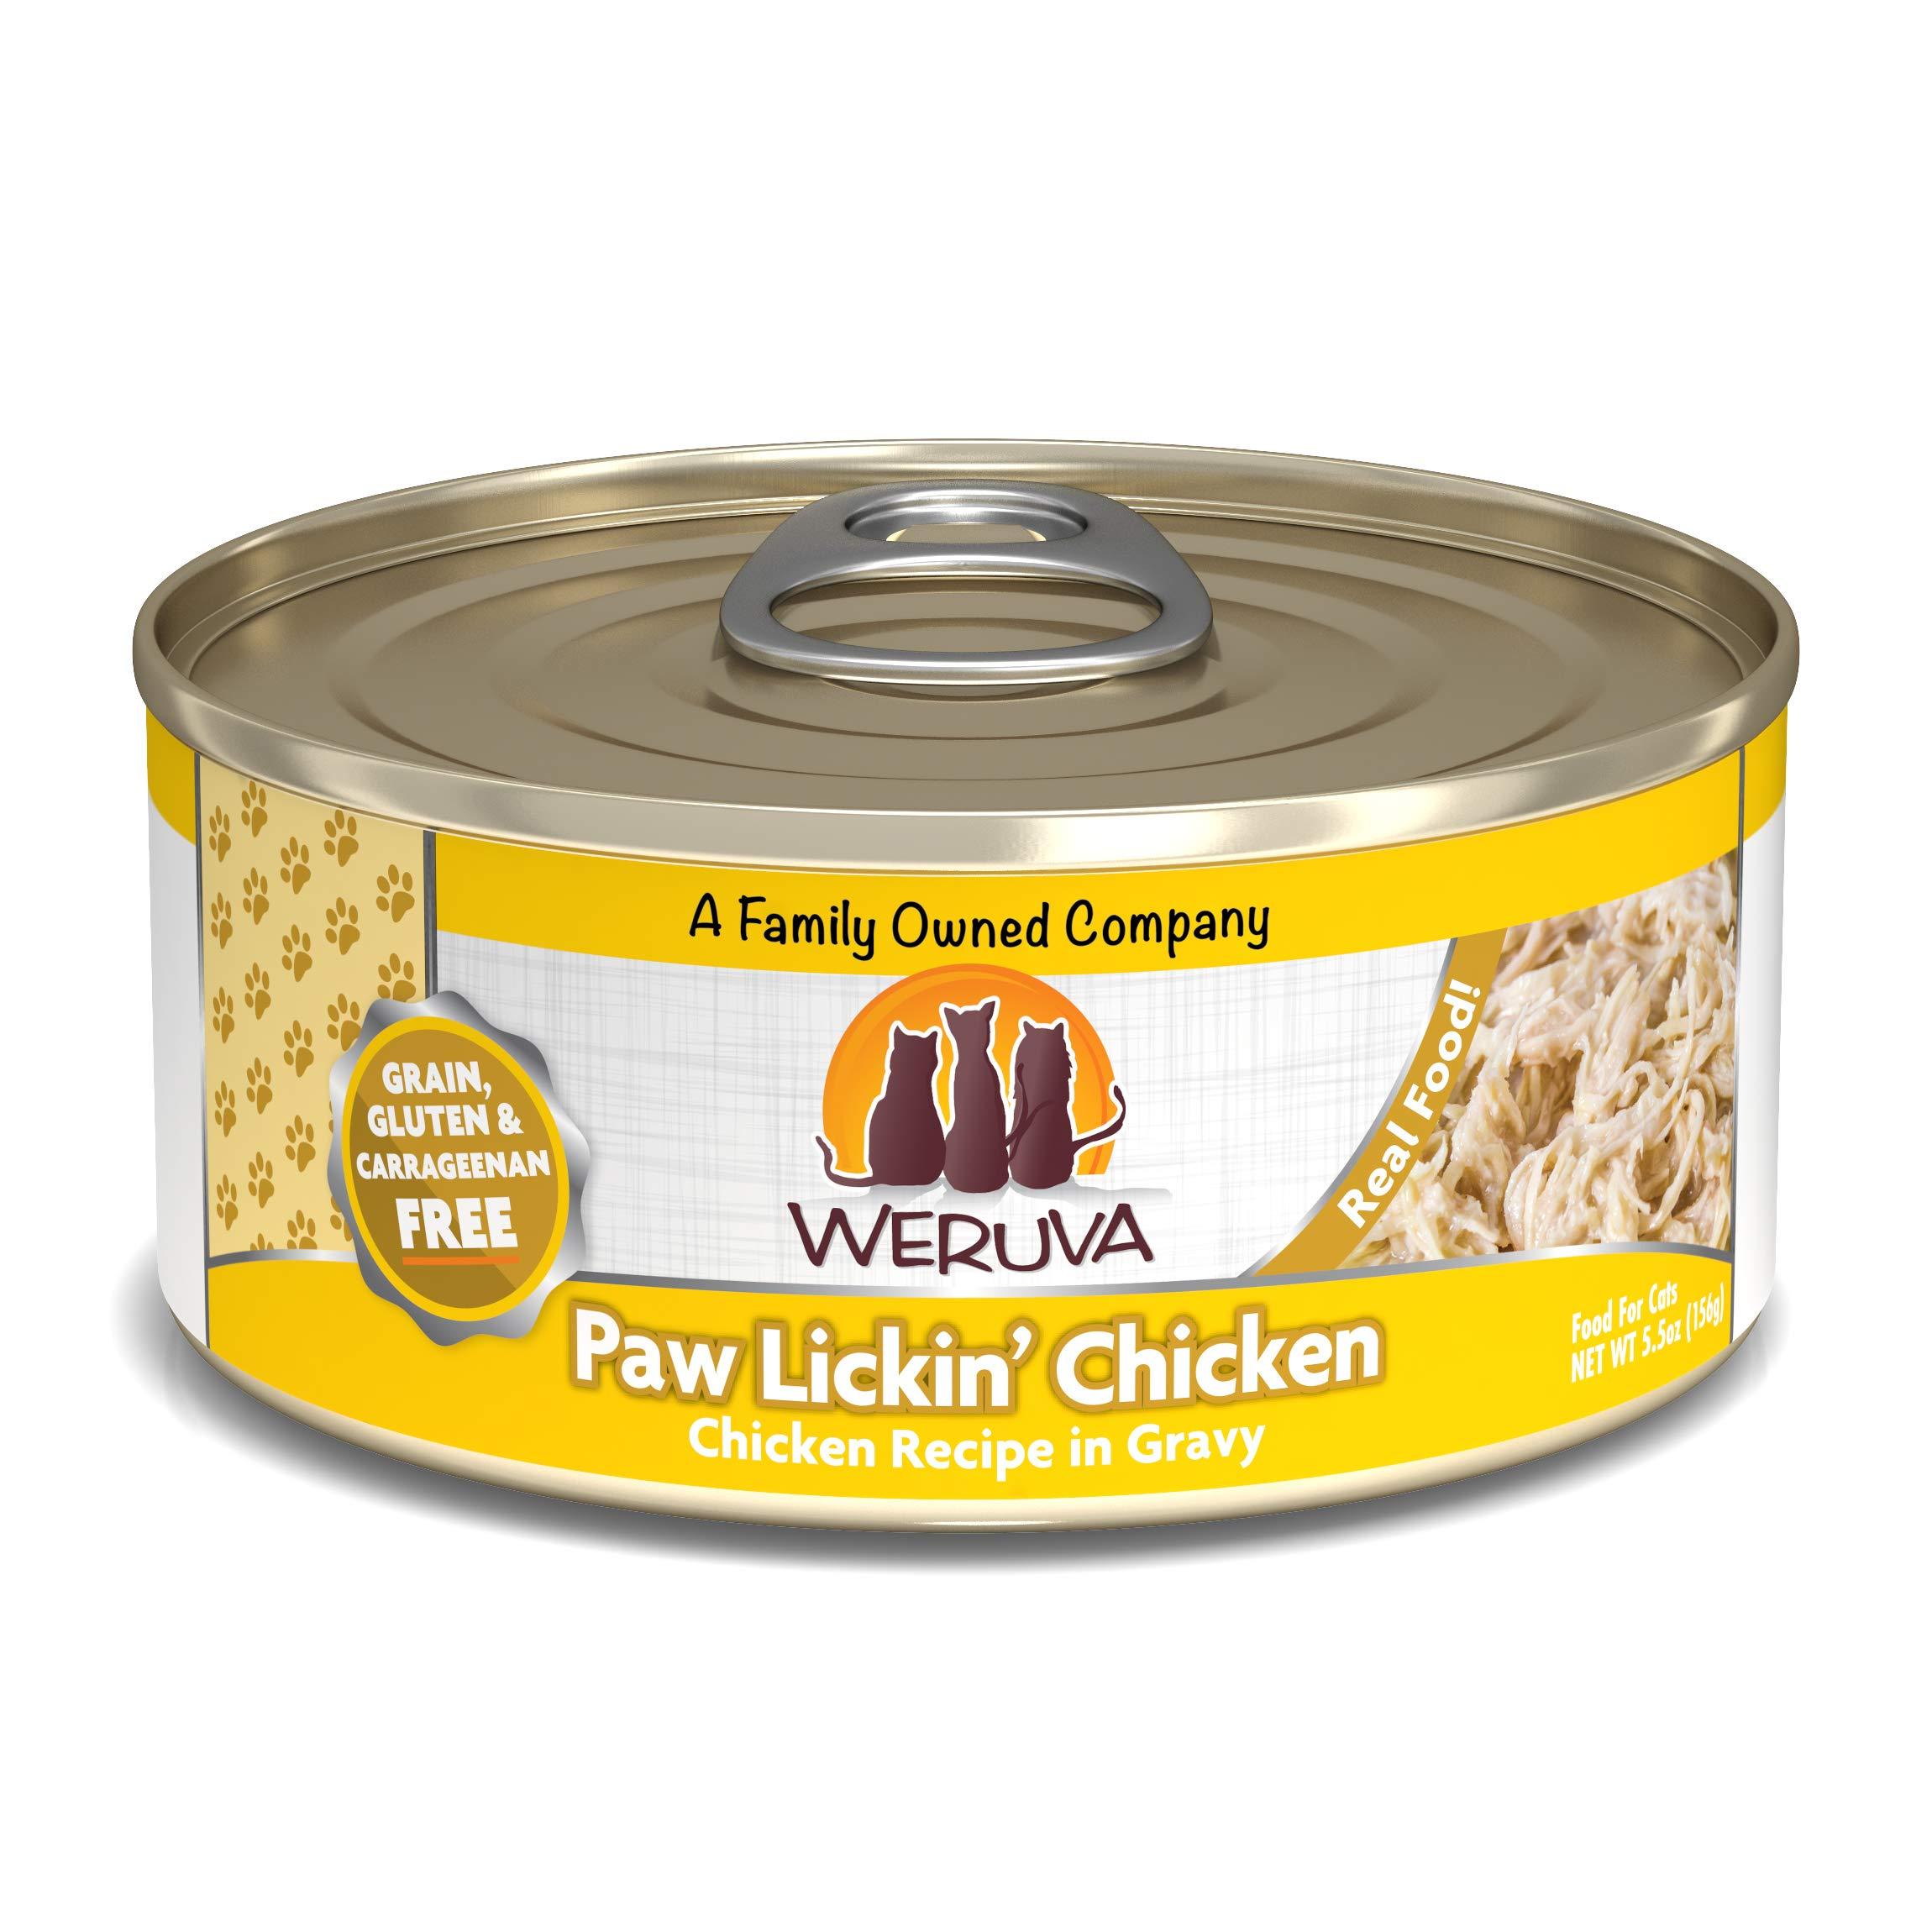 Weruva Classic Cat Food, Paw Lickin' Chicken With Chicken Breast In Gravy, 5.5Oz Can (Pack Of 24) by Weruva